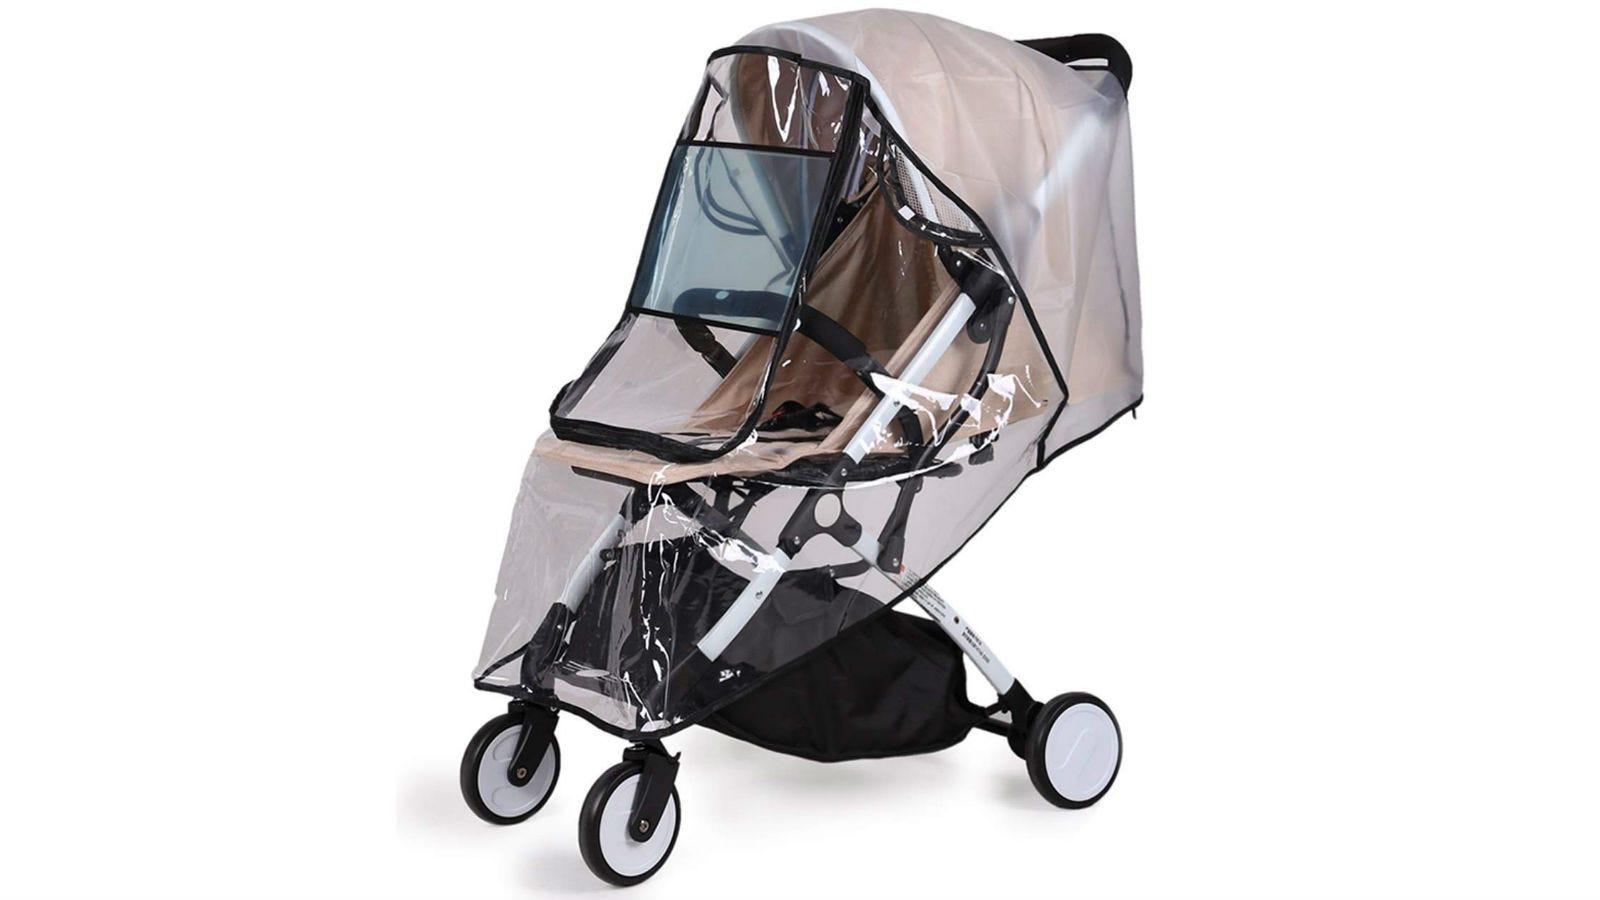 The Bemece Universal Rain Cover on a stroller.